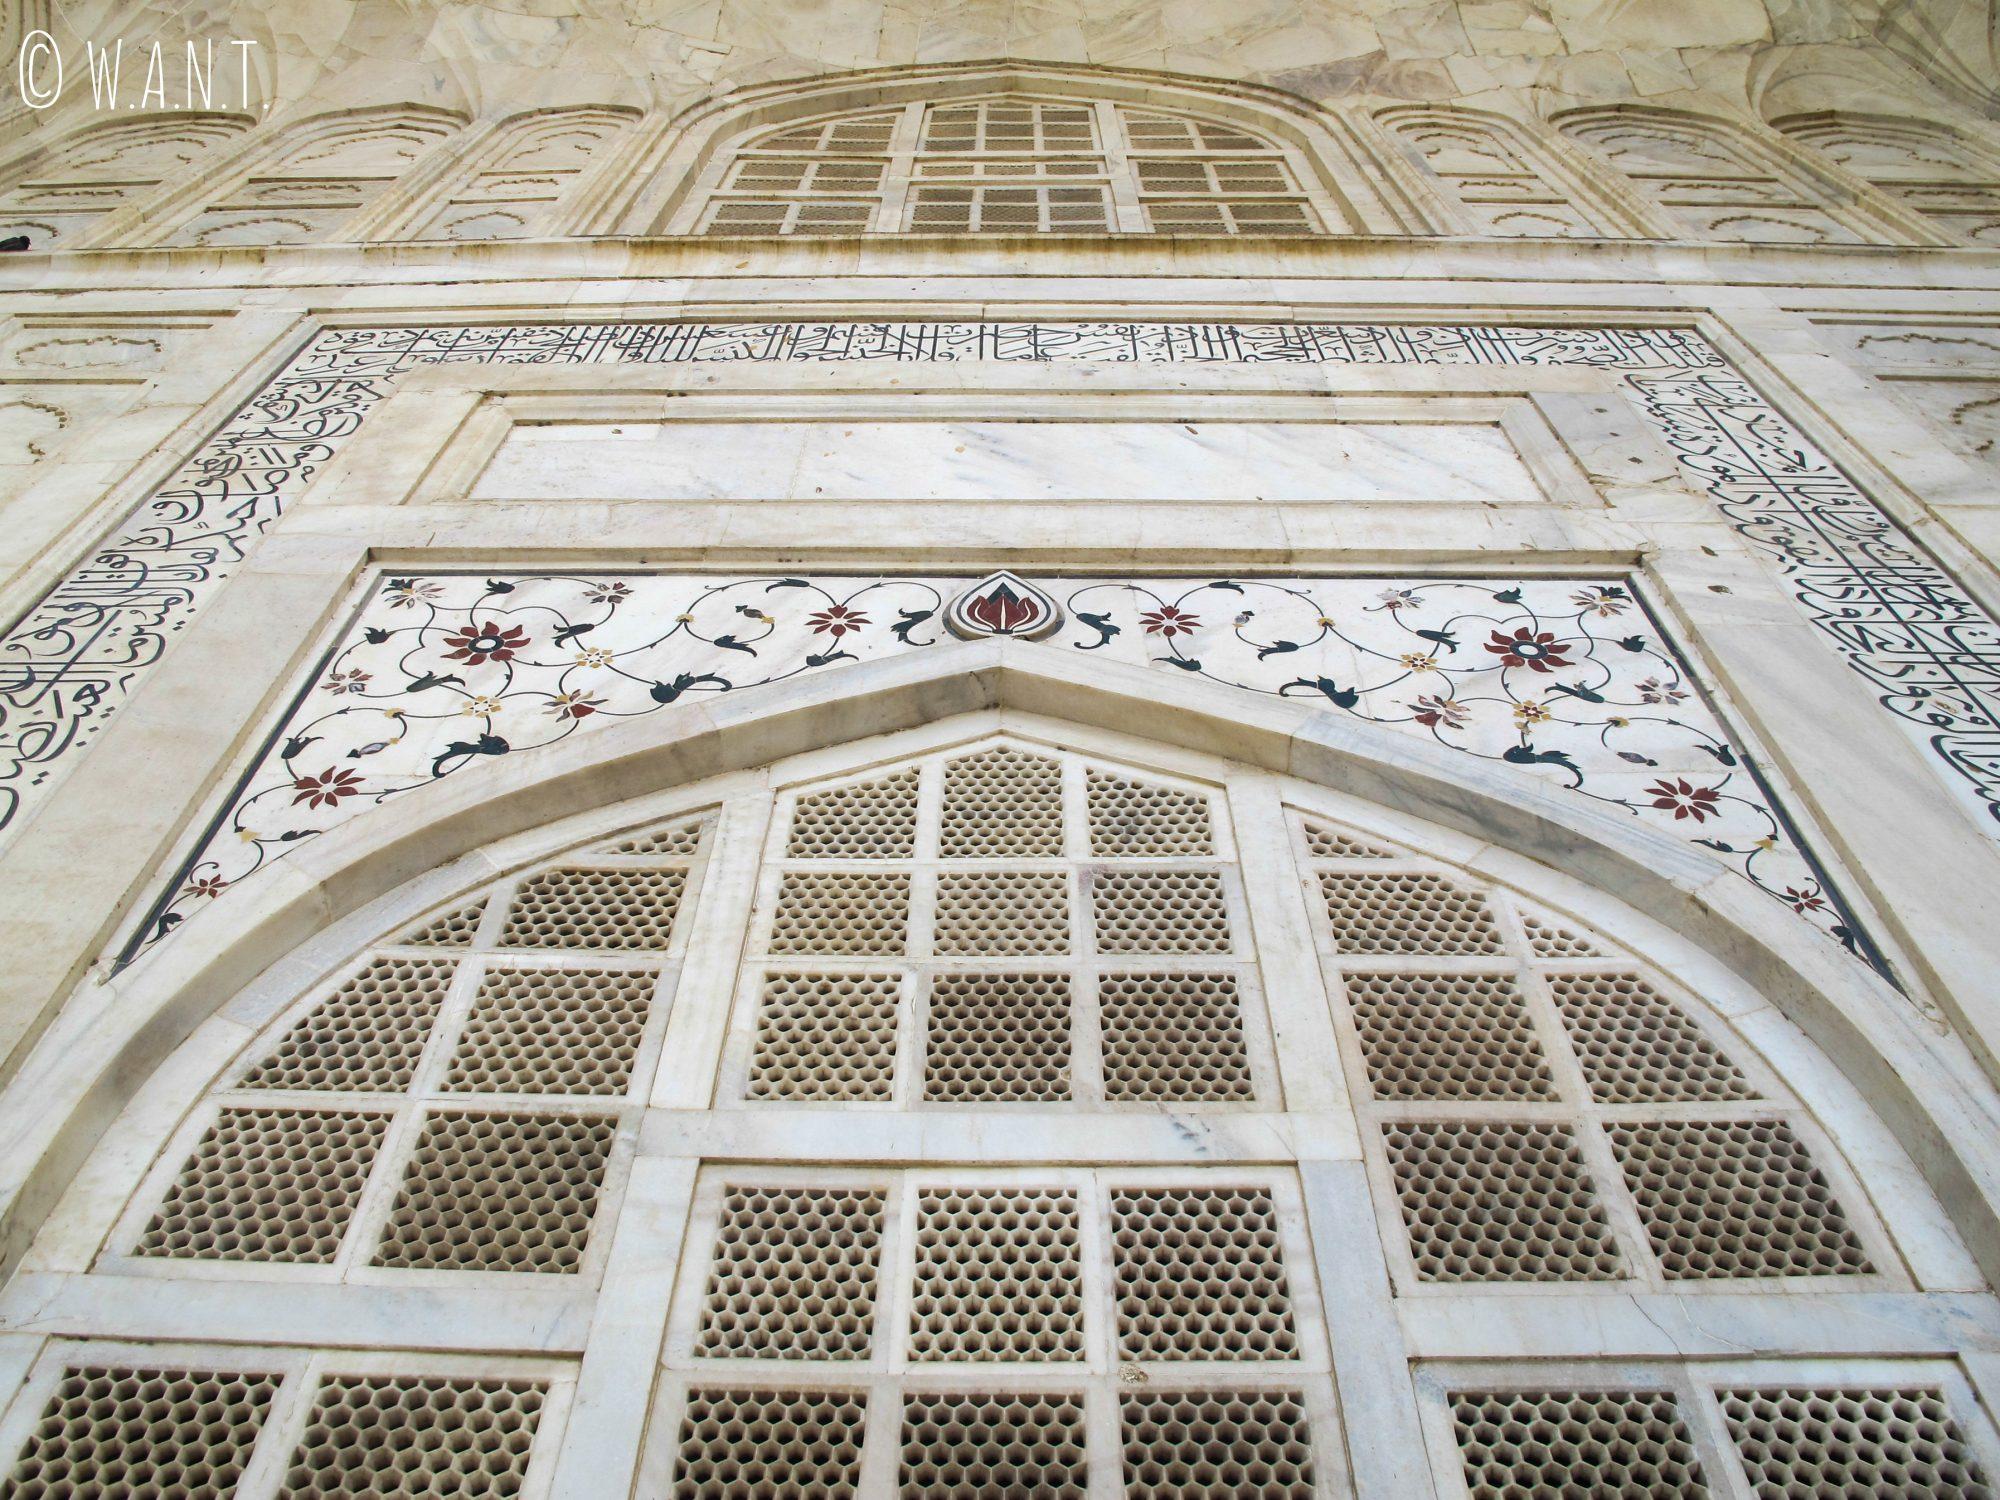 Perspective en contrebas de l'entrée du mausolée du Taj Mahal